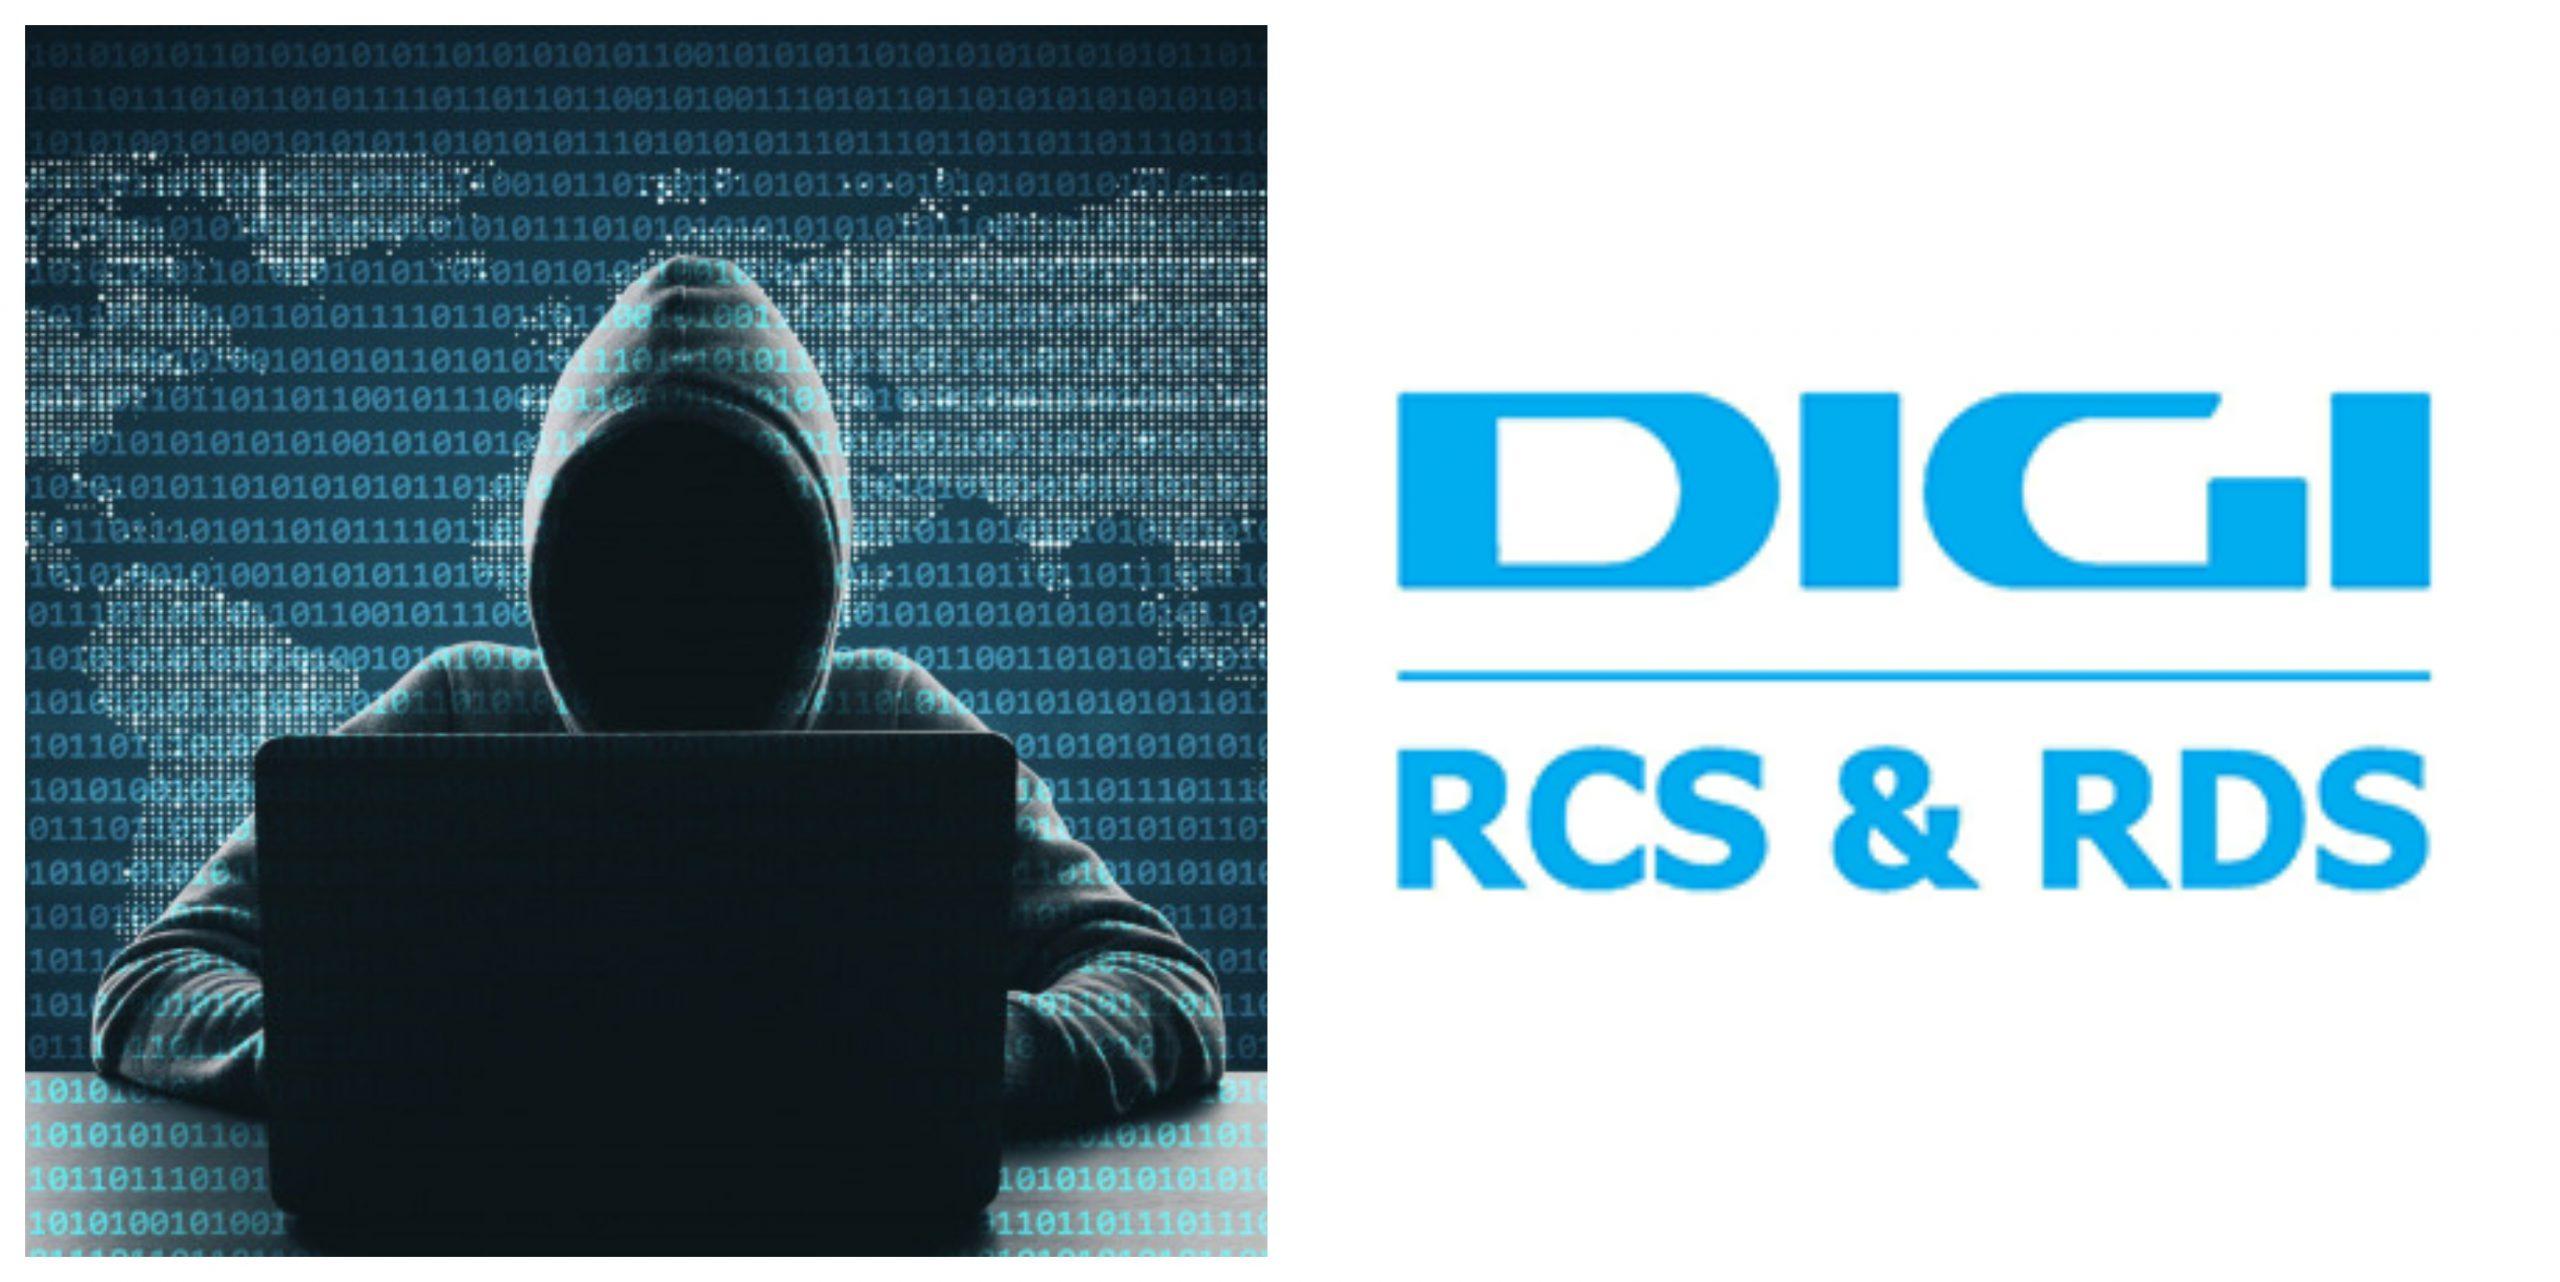 Anunț important pentru toți clienții DIGI RCS-RDS. Cum pot fi fraudați